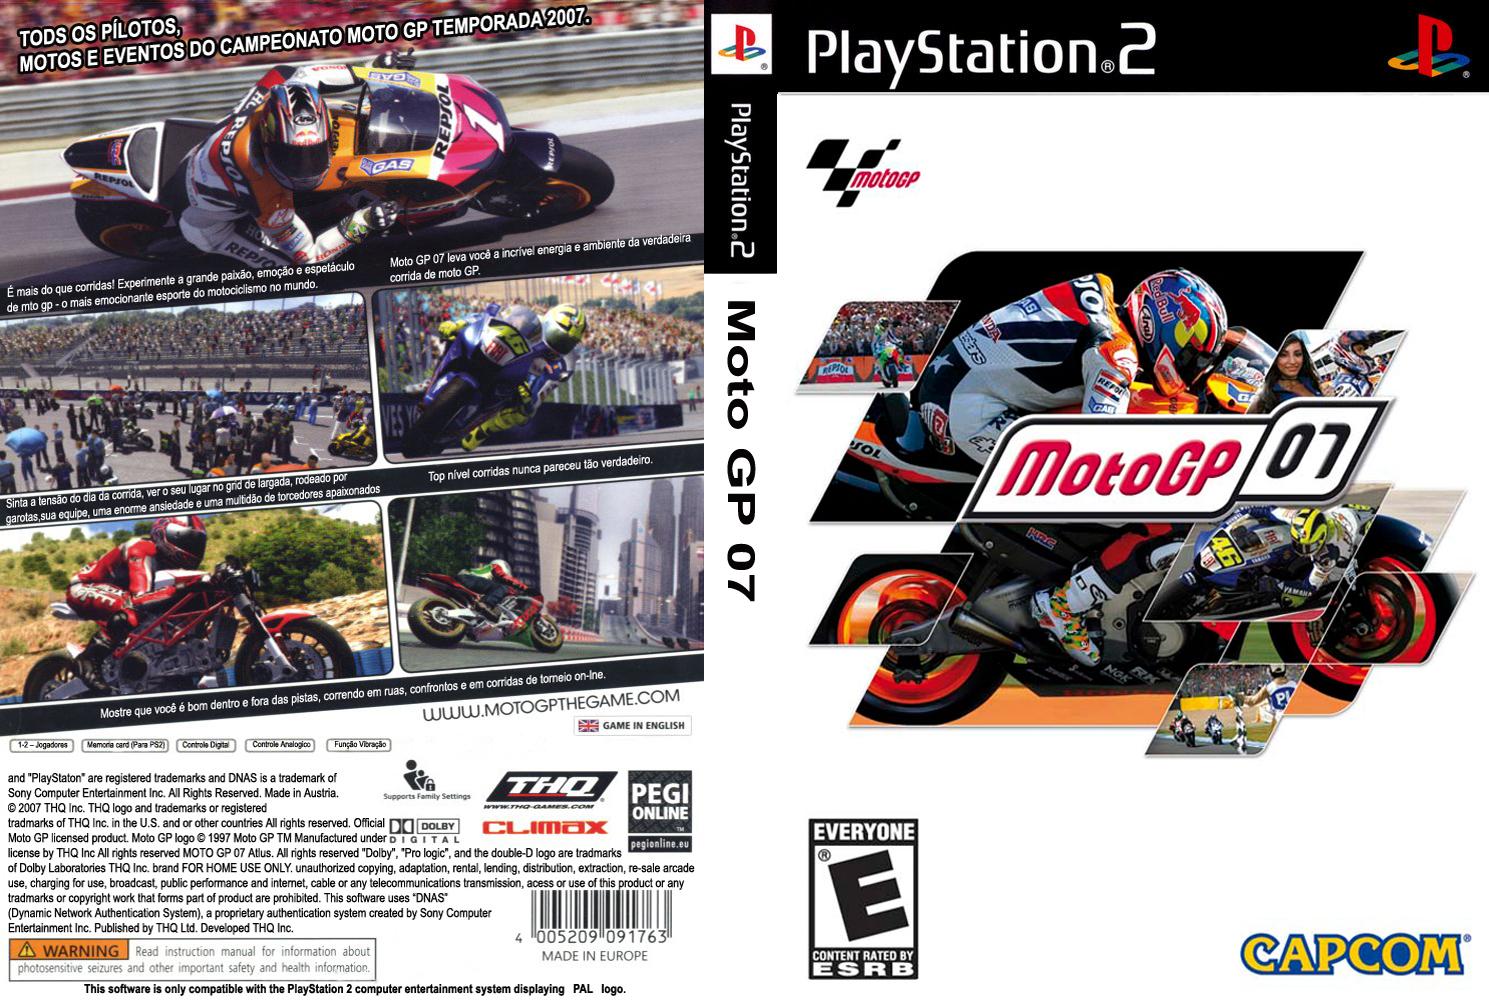 MotoGP07